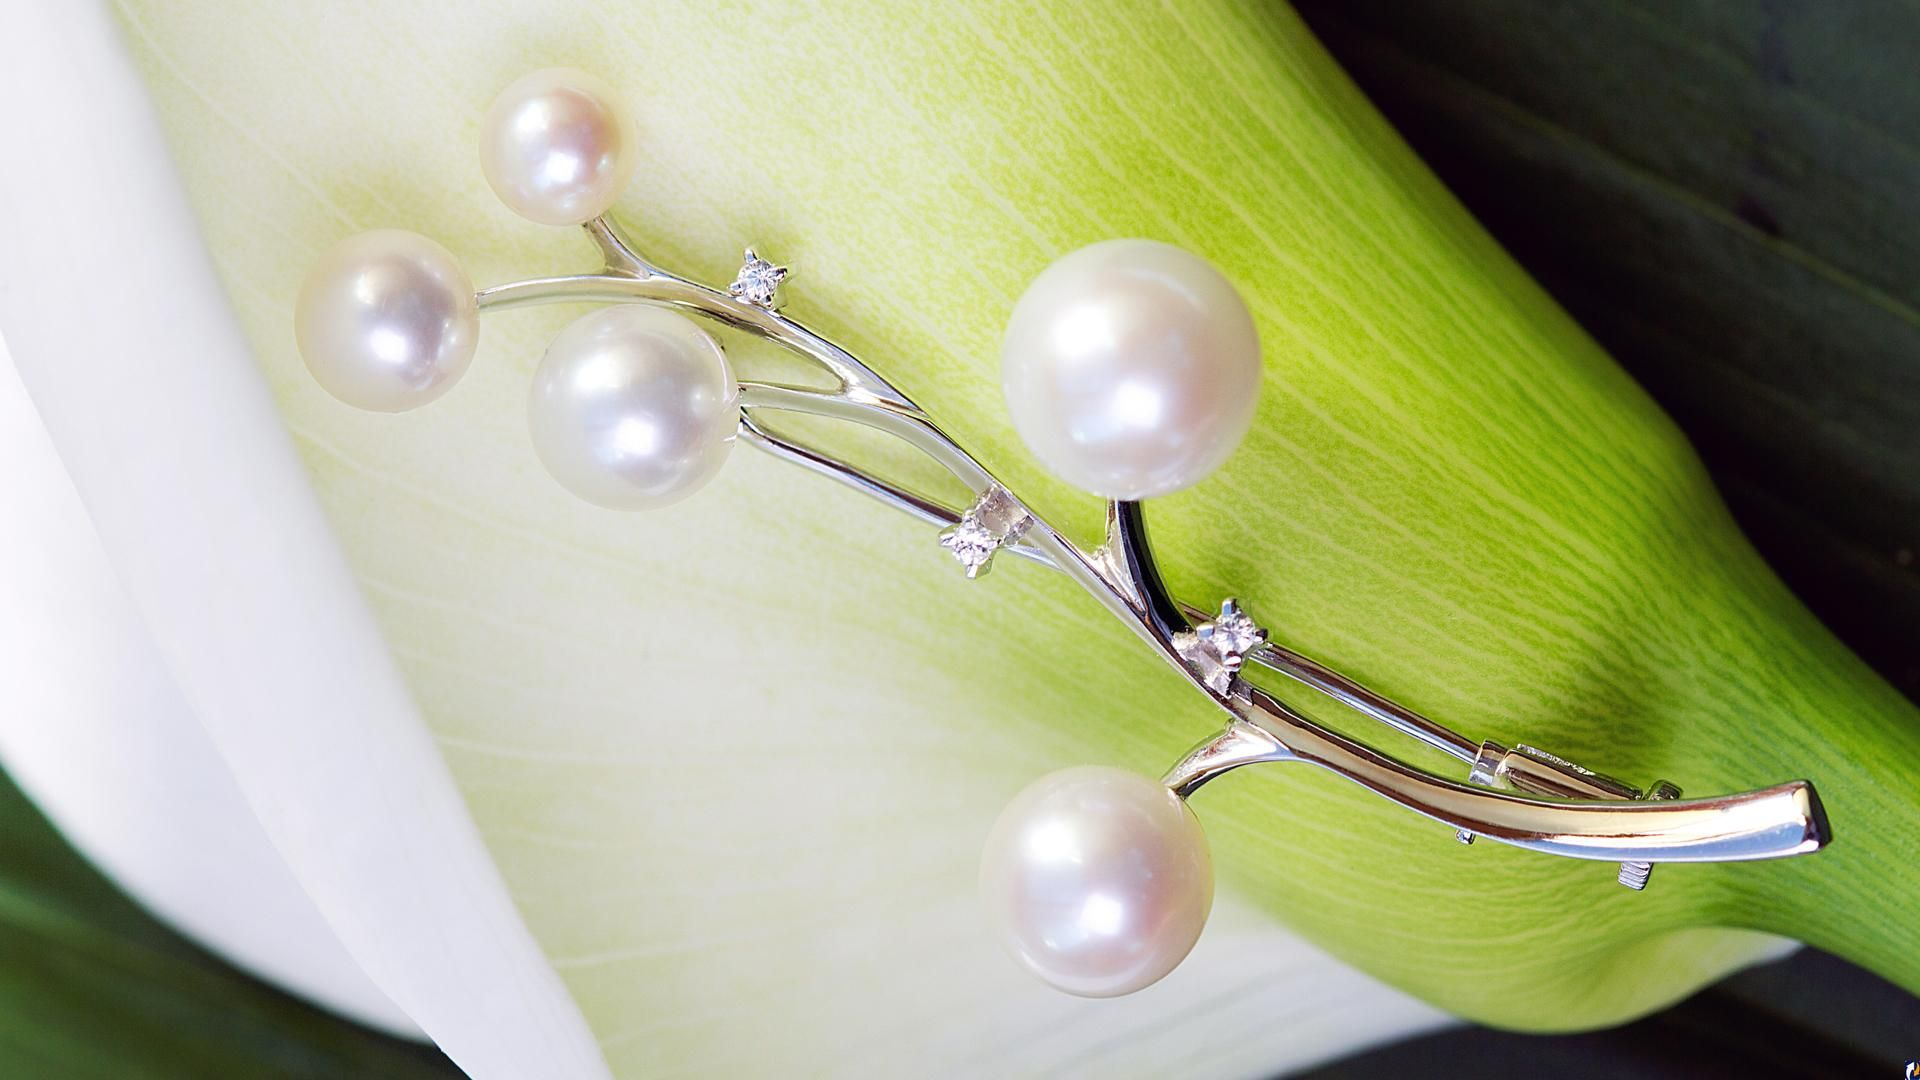 Pearl wallpaper picture hd